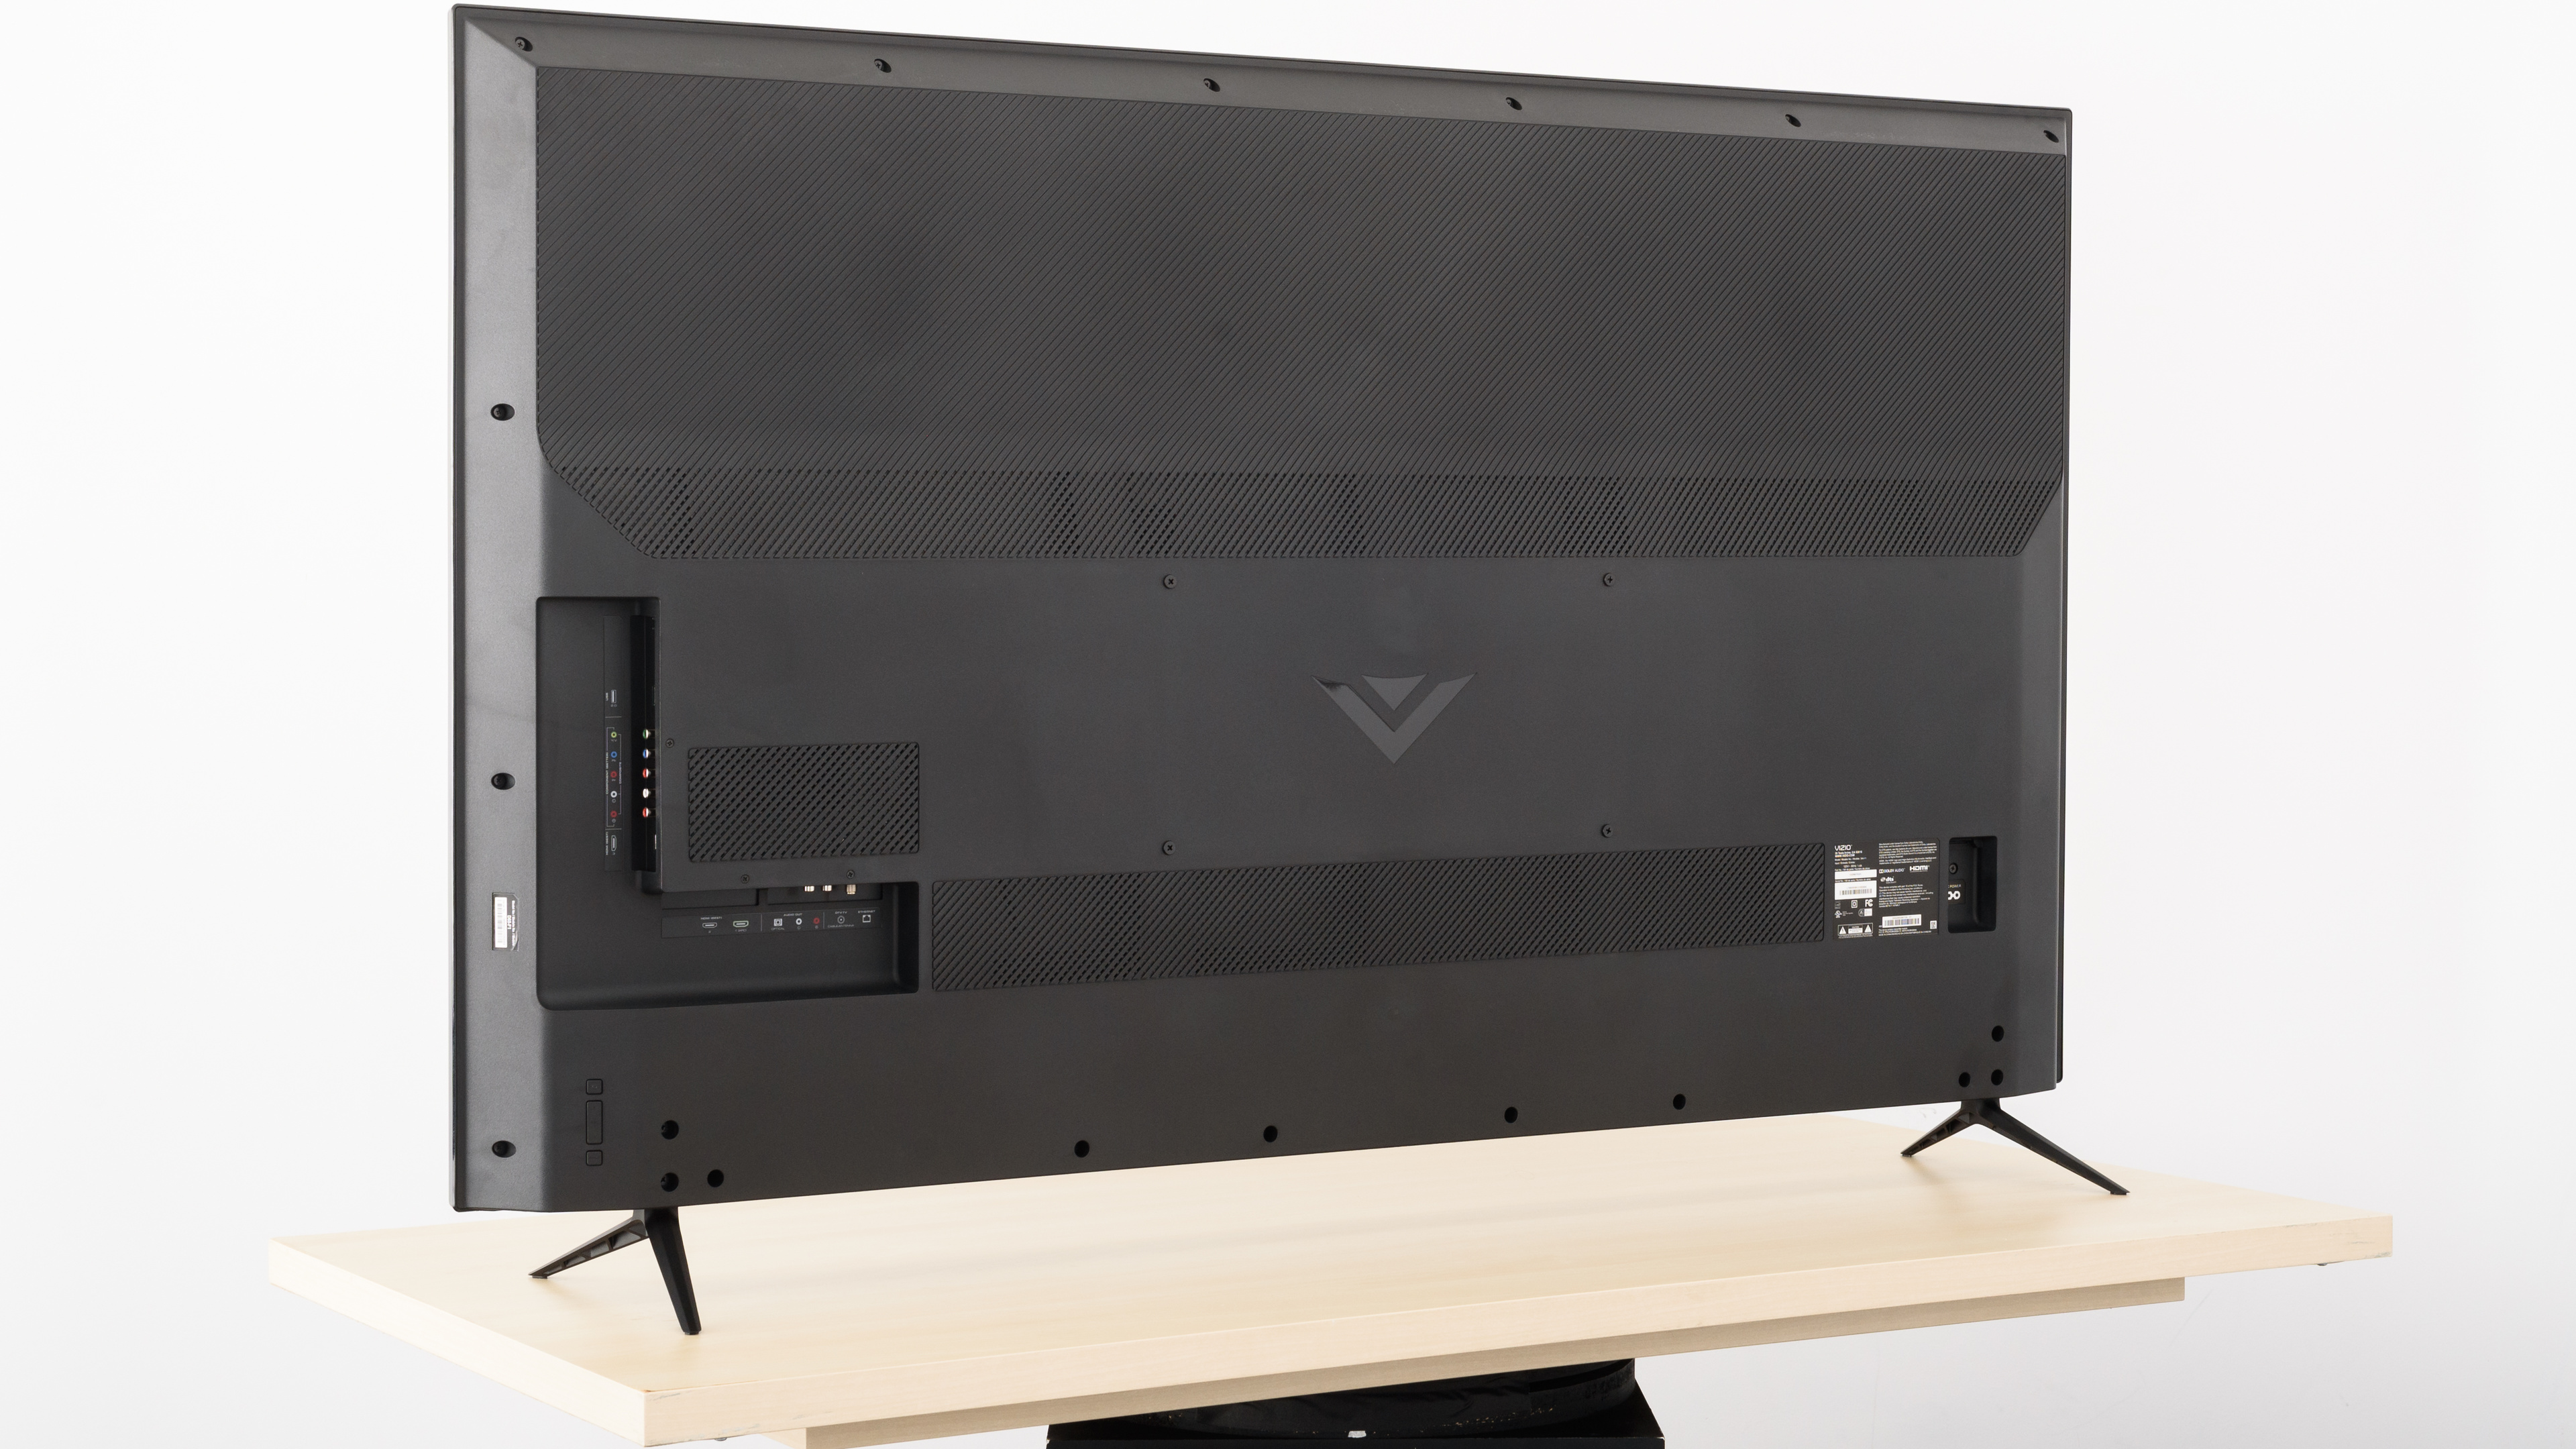 Vizio D Series 4k 2018 Review D43 F1 D55 F2 D60 F3 D65